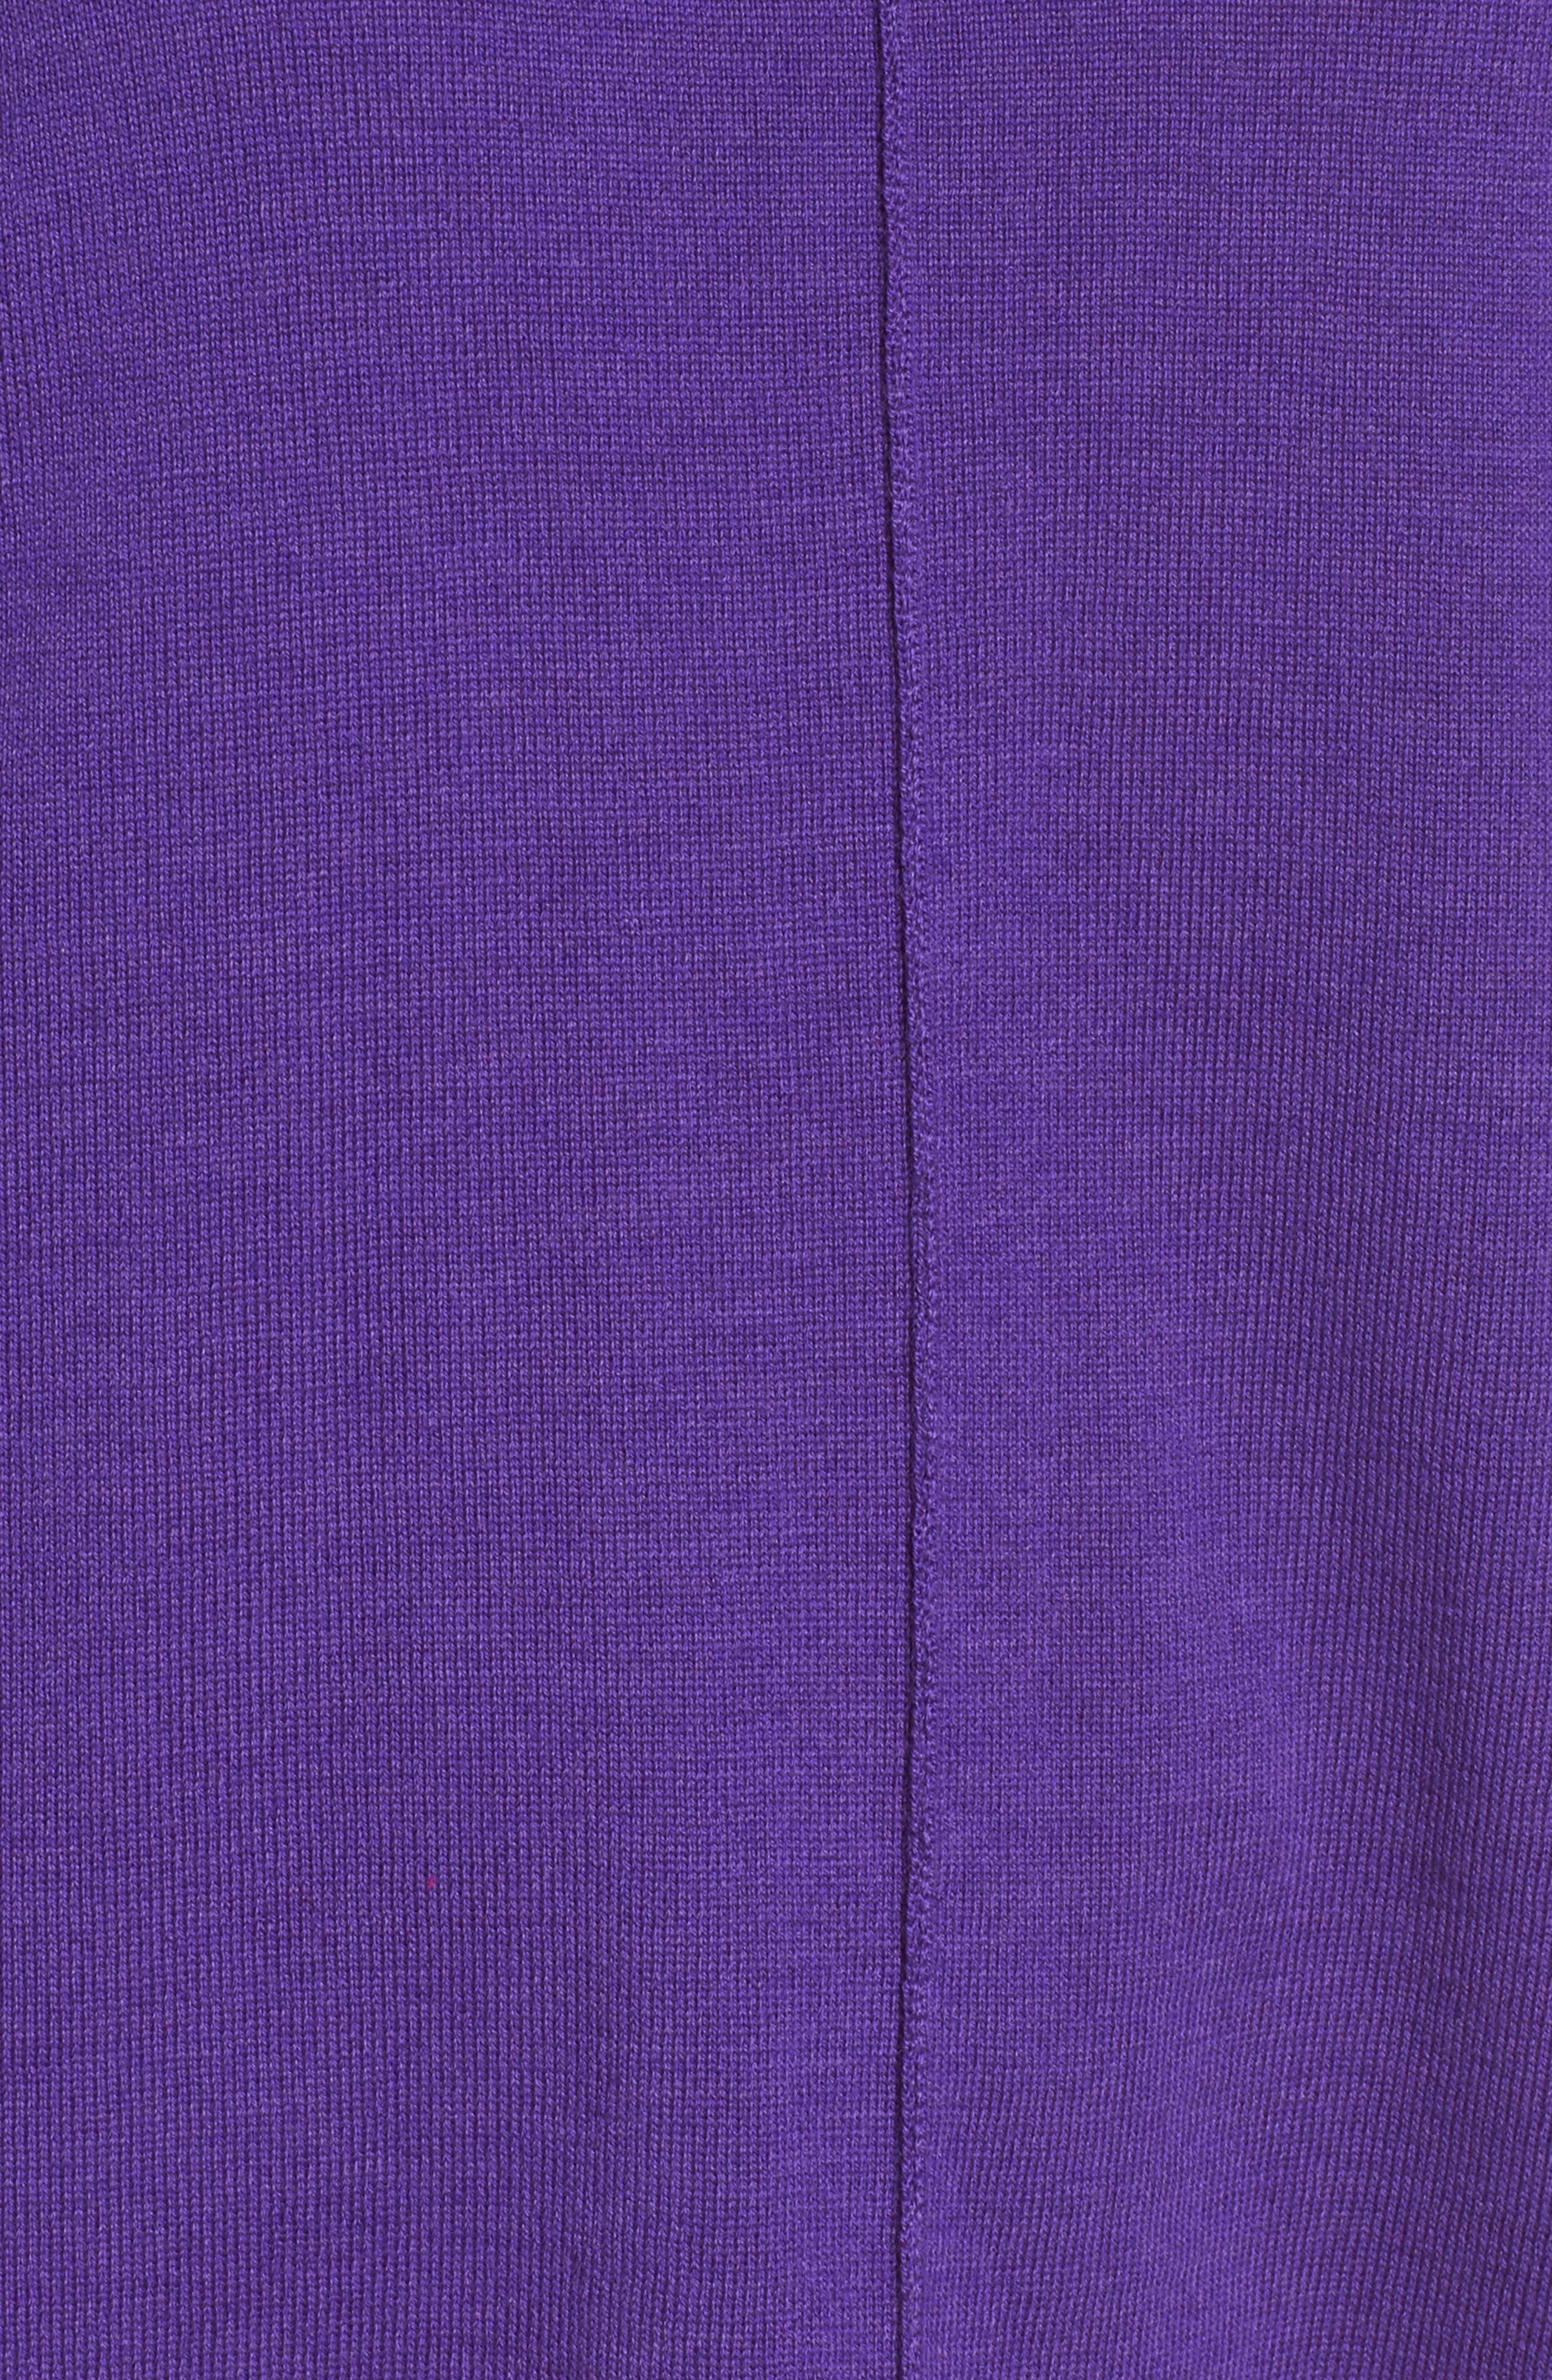 Merino Wool Boxy Turtleneck Sweater,                             Alternate thumbnail 29, color,